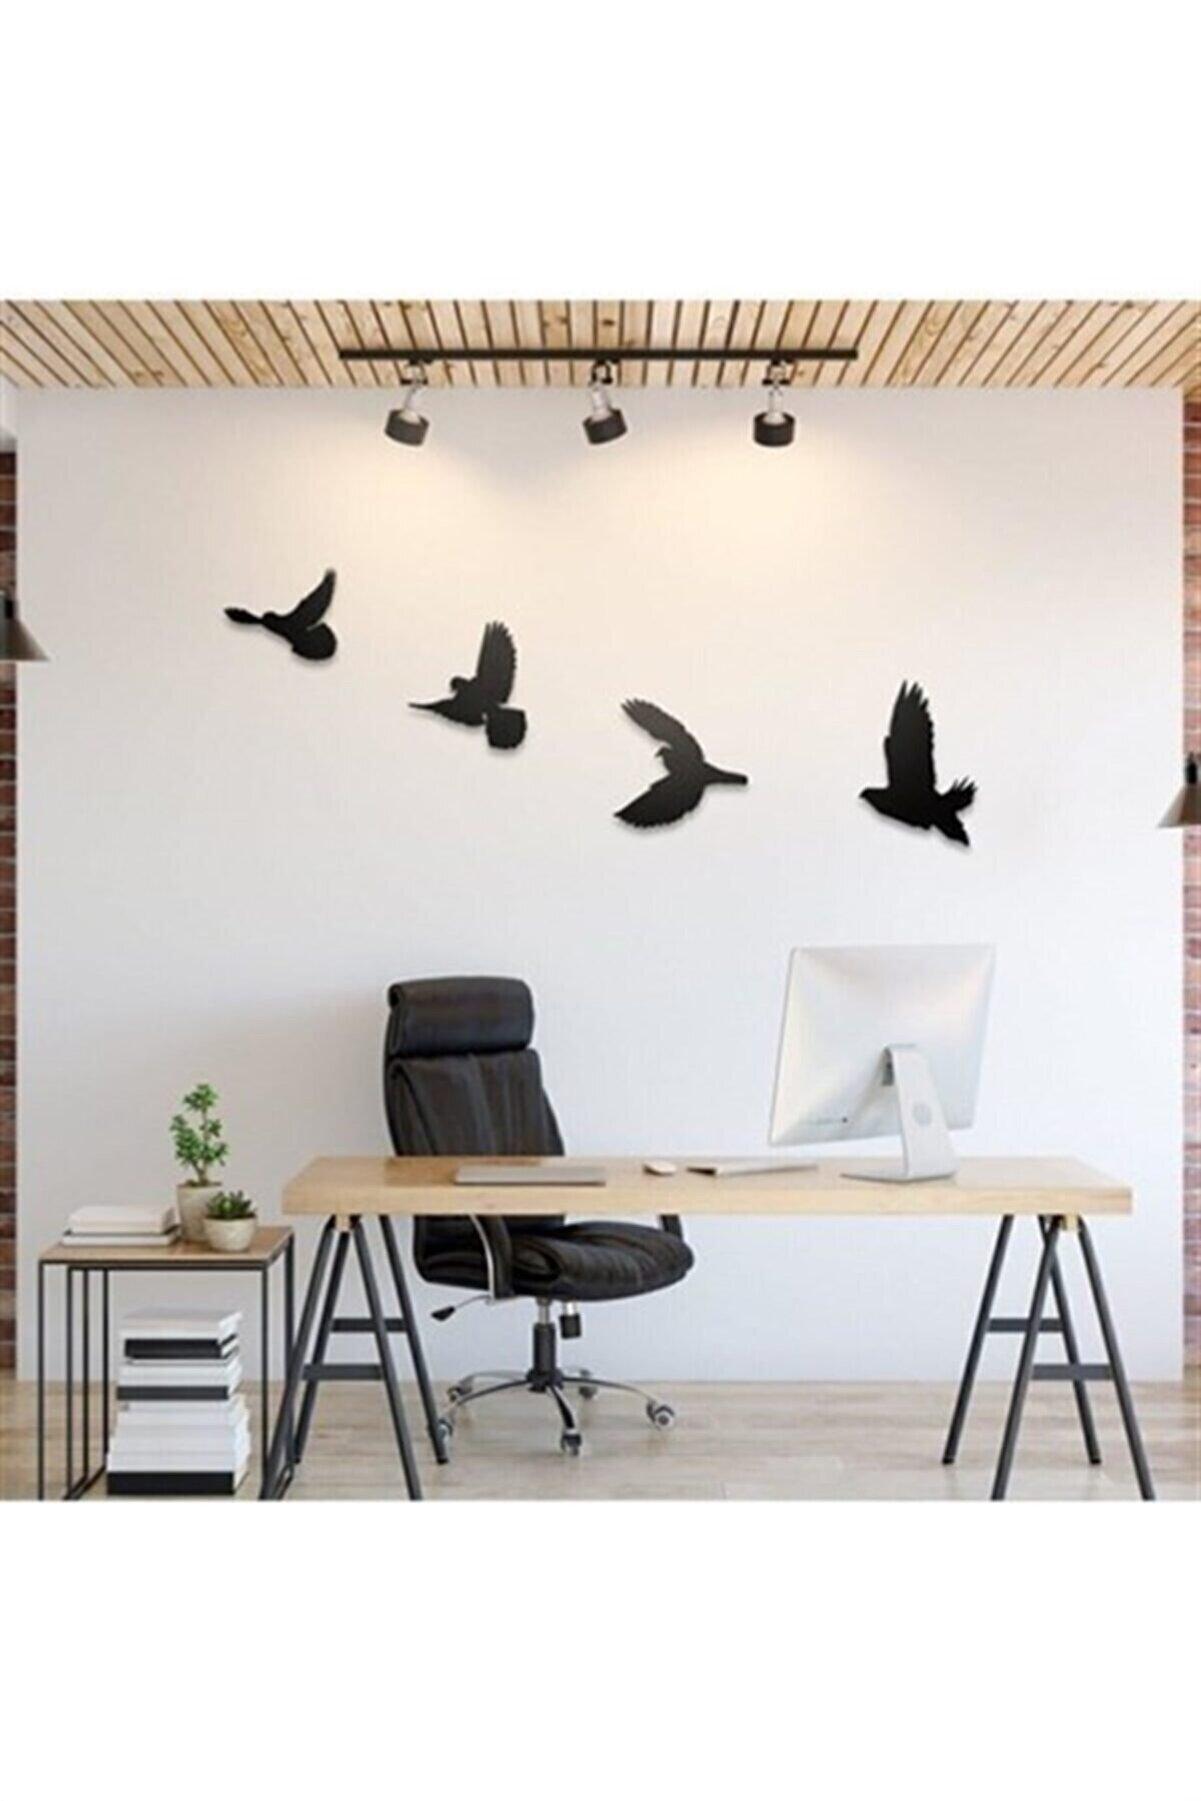 İkbal market Dekoratif Modern Dörtlü Kuş Duvar Süsü Duvar Dekoru Ahşap